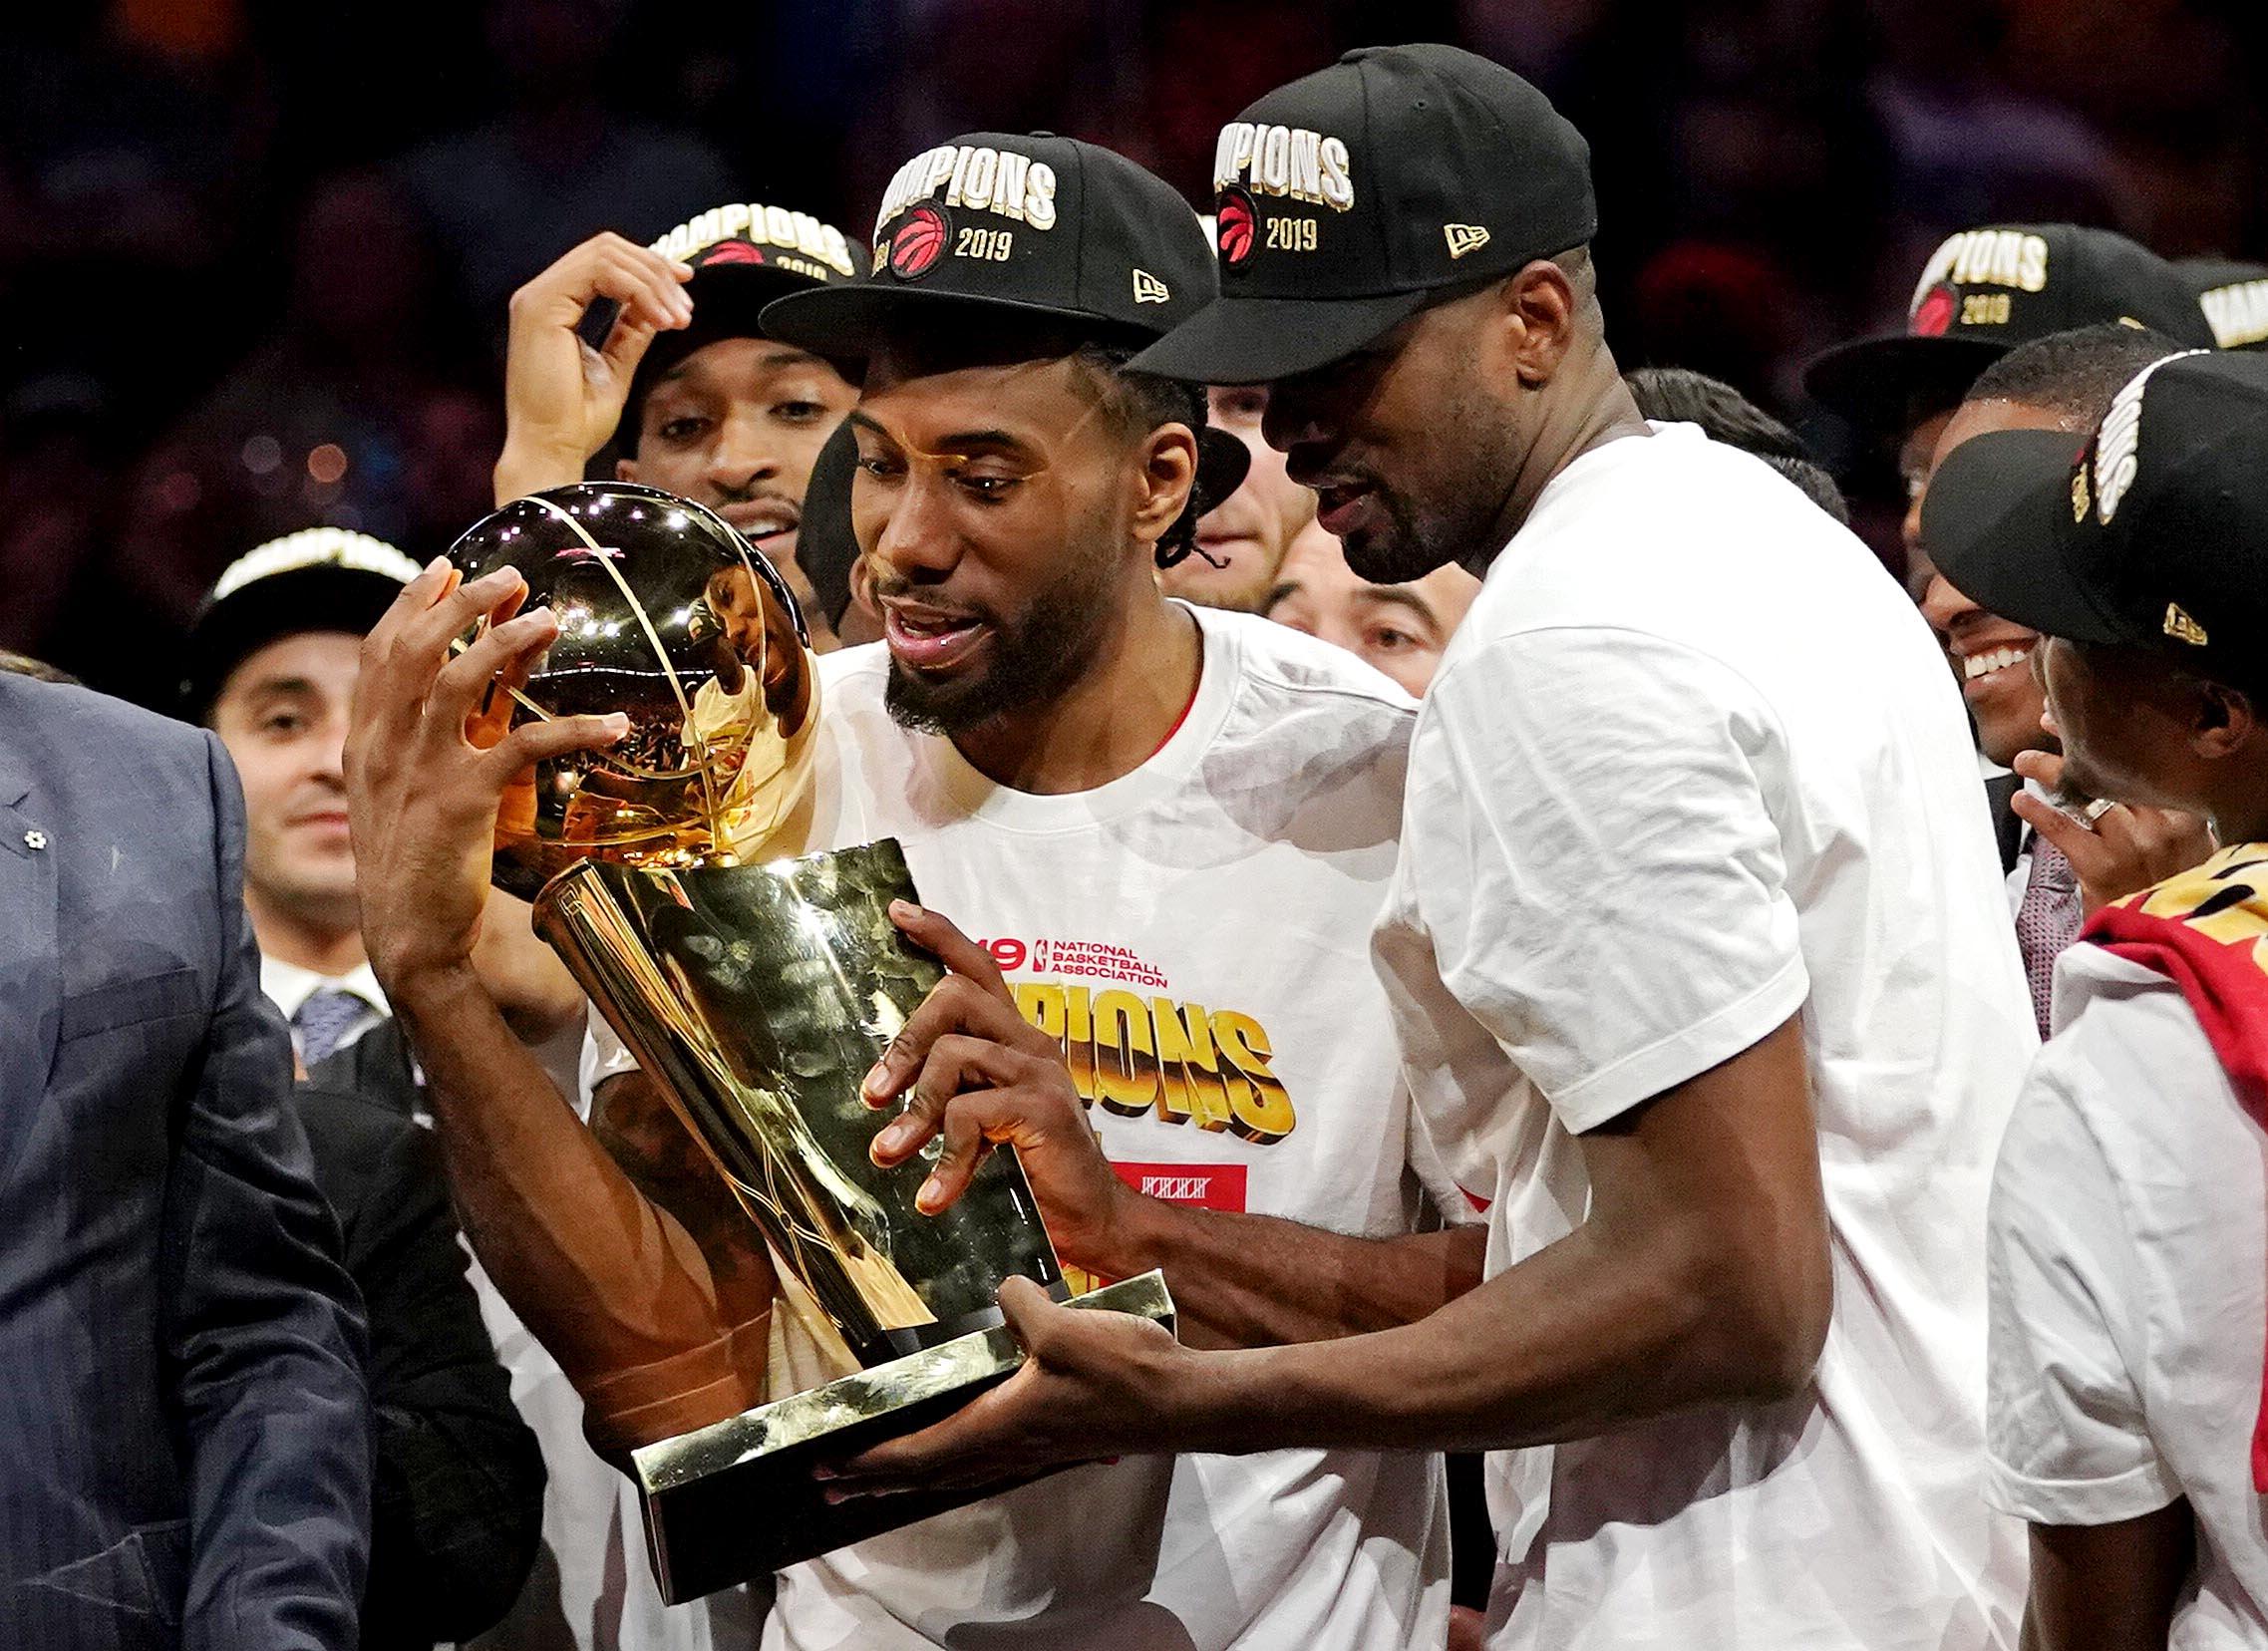 2019-06-14T042724Z_576598248_NOCID_RTRMADP_3_NBA-FINALS-TORONTO-RAPTORS-AT-GOLDEN-STATE-WARRIORS